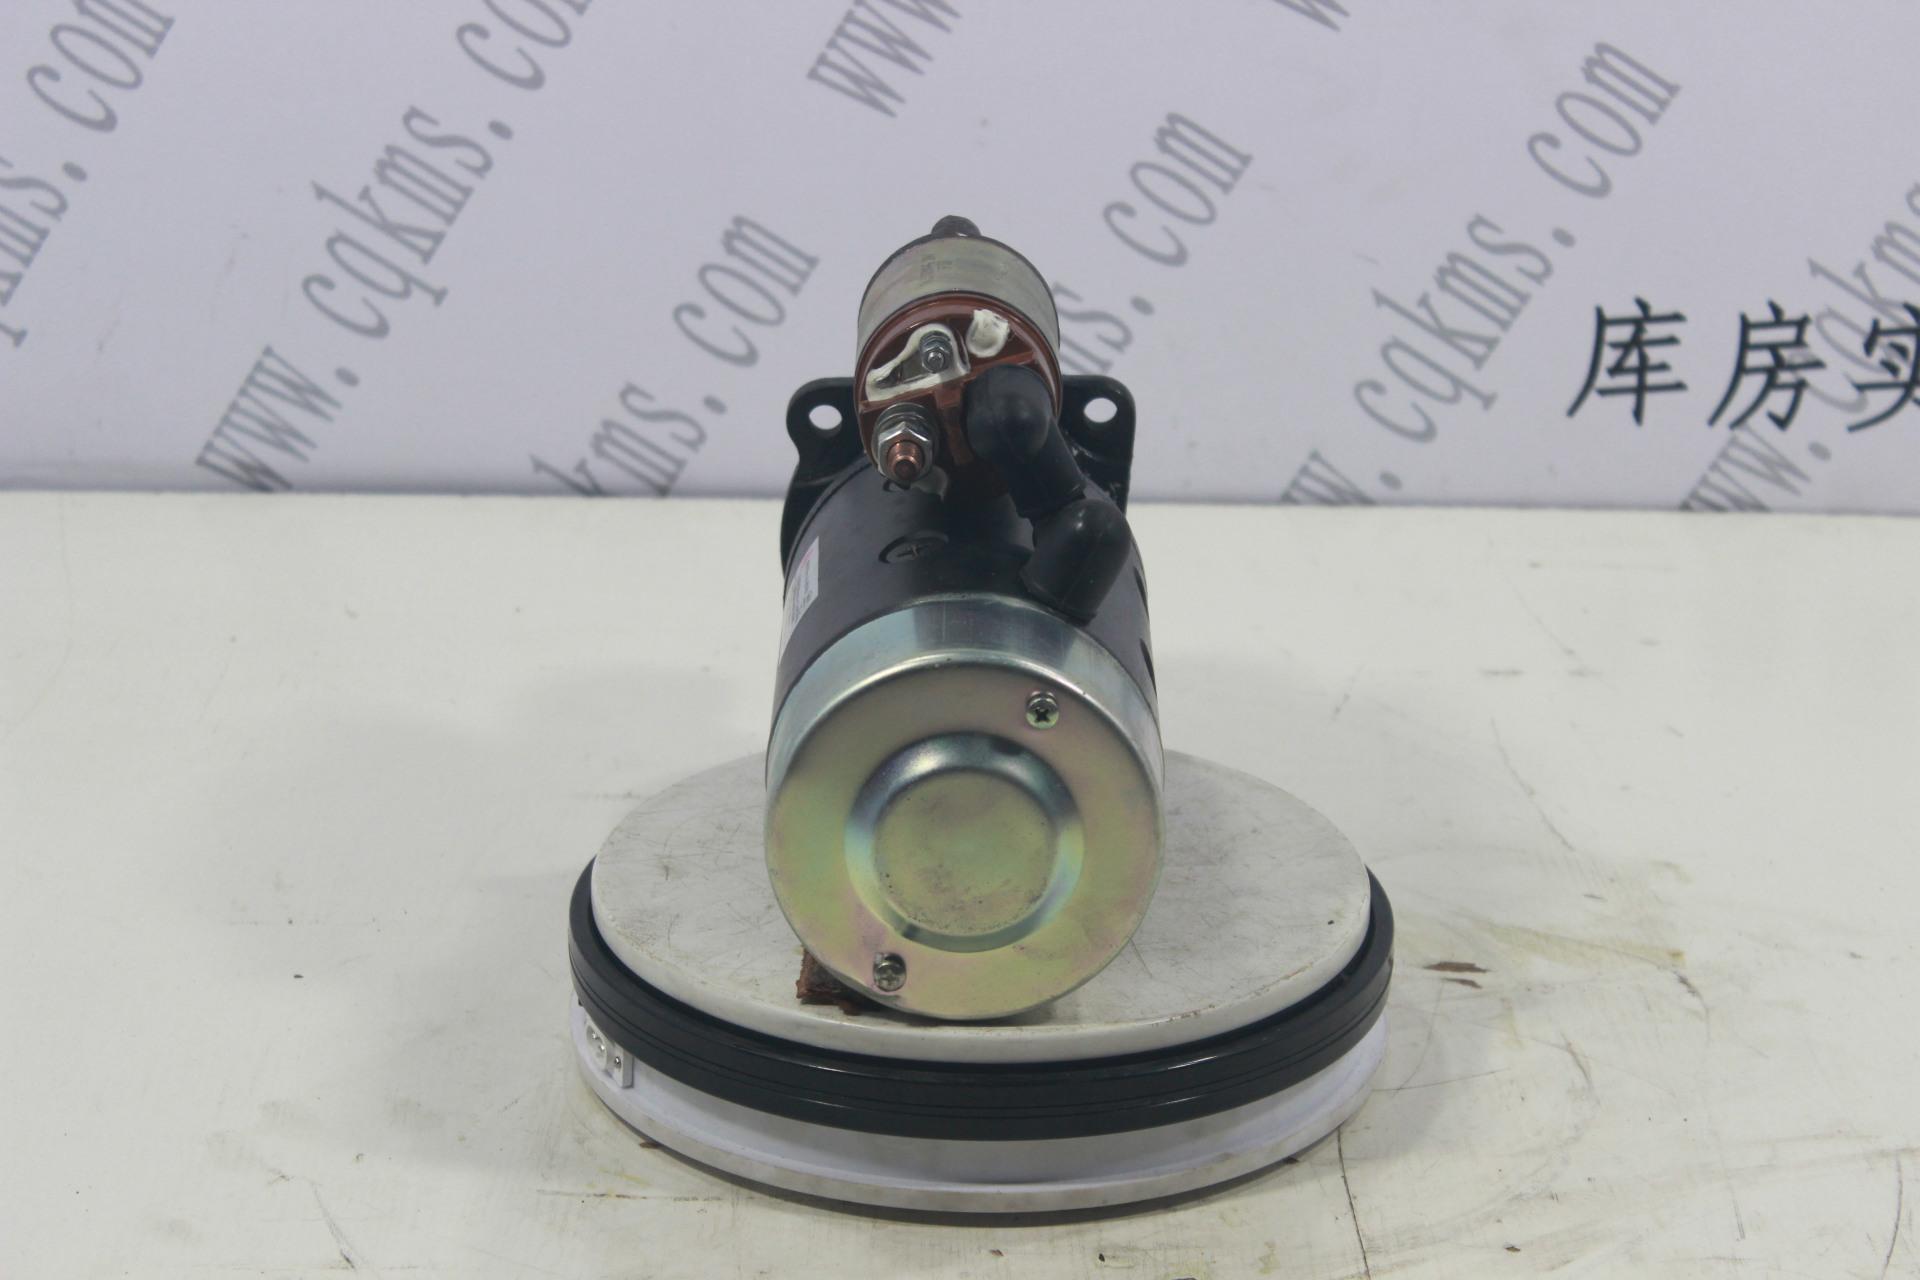 kms01261-4935789-起动机总成-用于6B5.9康明斯发动机-6B5.9-参考规格46.5*31*24CM-参考重量15.25KG含包装-15.25KG含包装图片4